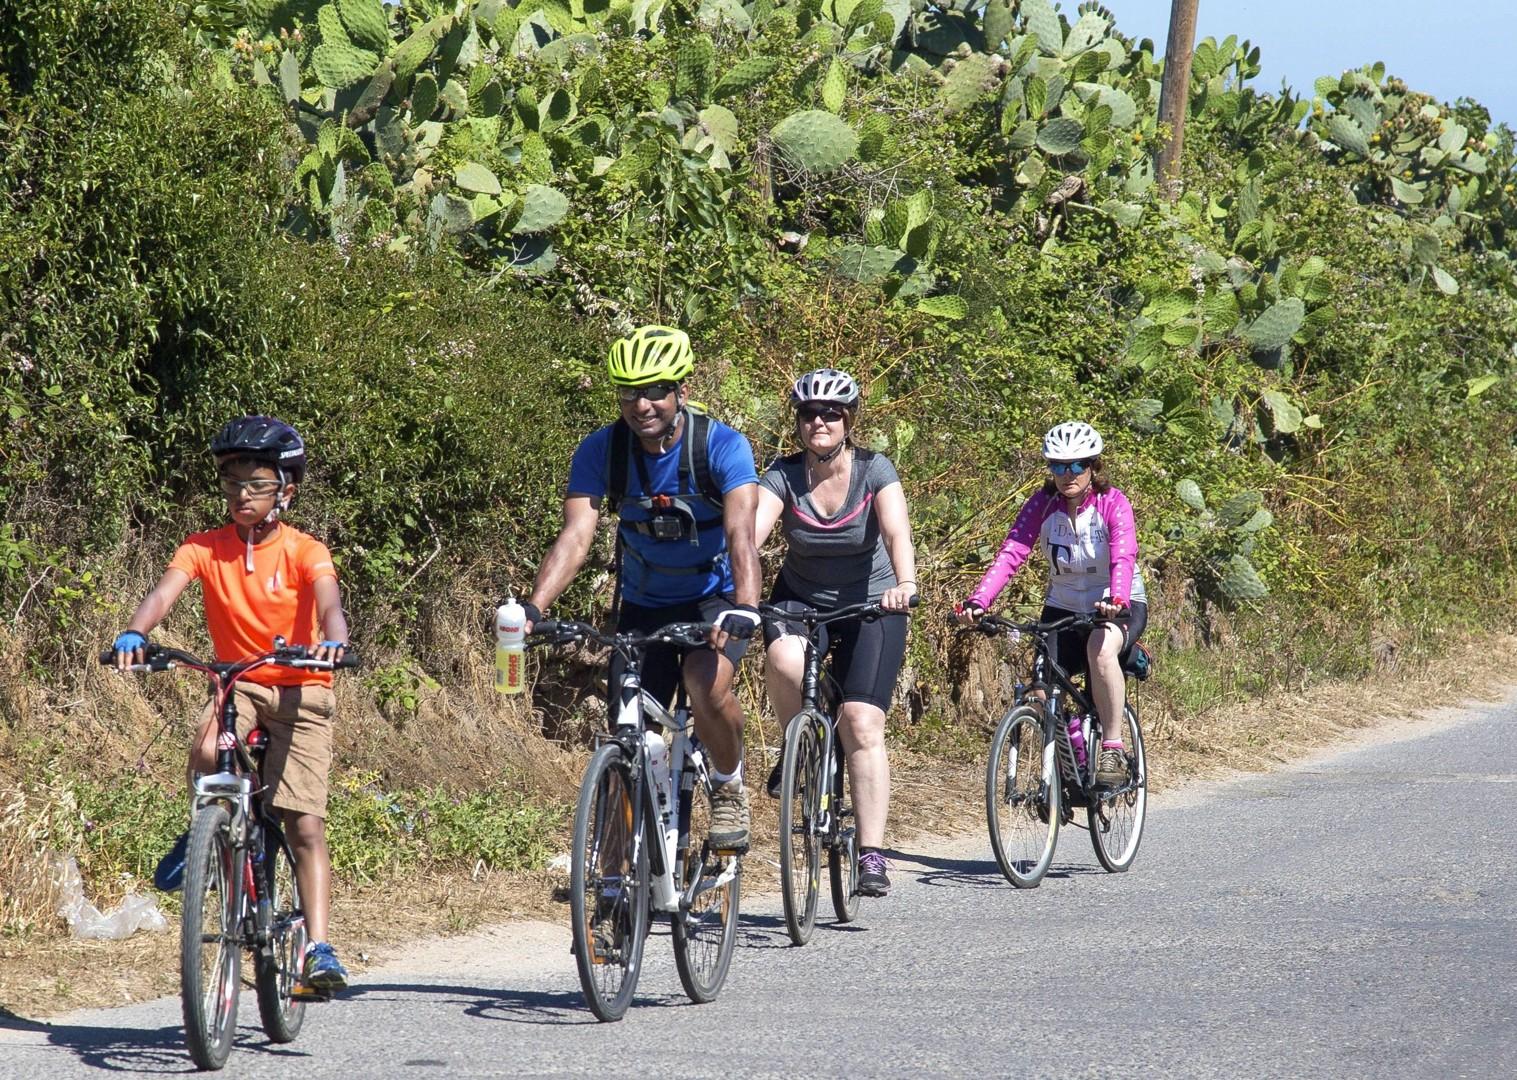 SardiniaCycling-101.jpg - Italy - Sardinia - Family Flavours - Family Cycling